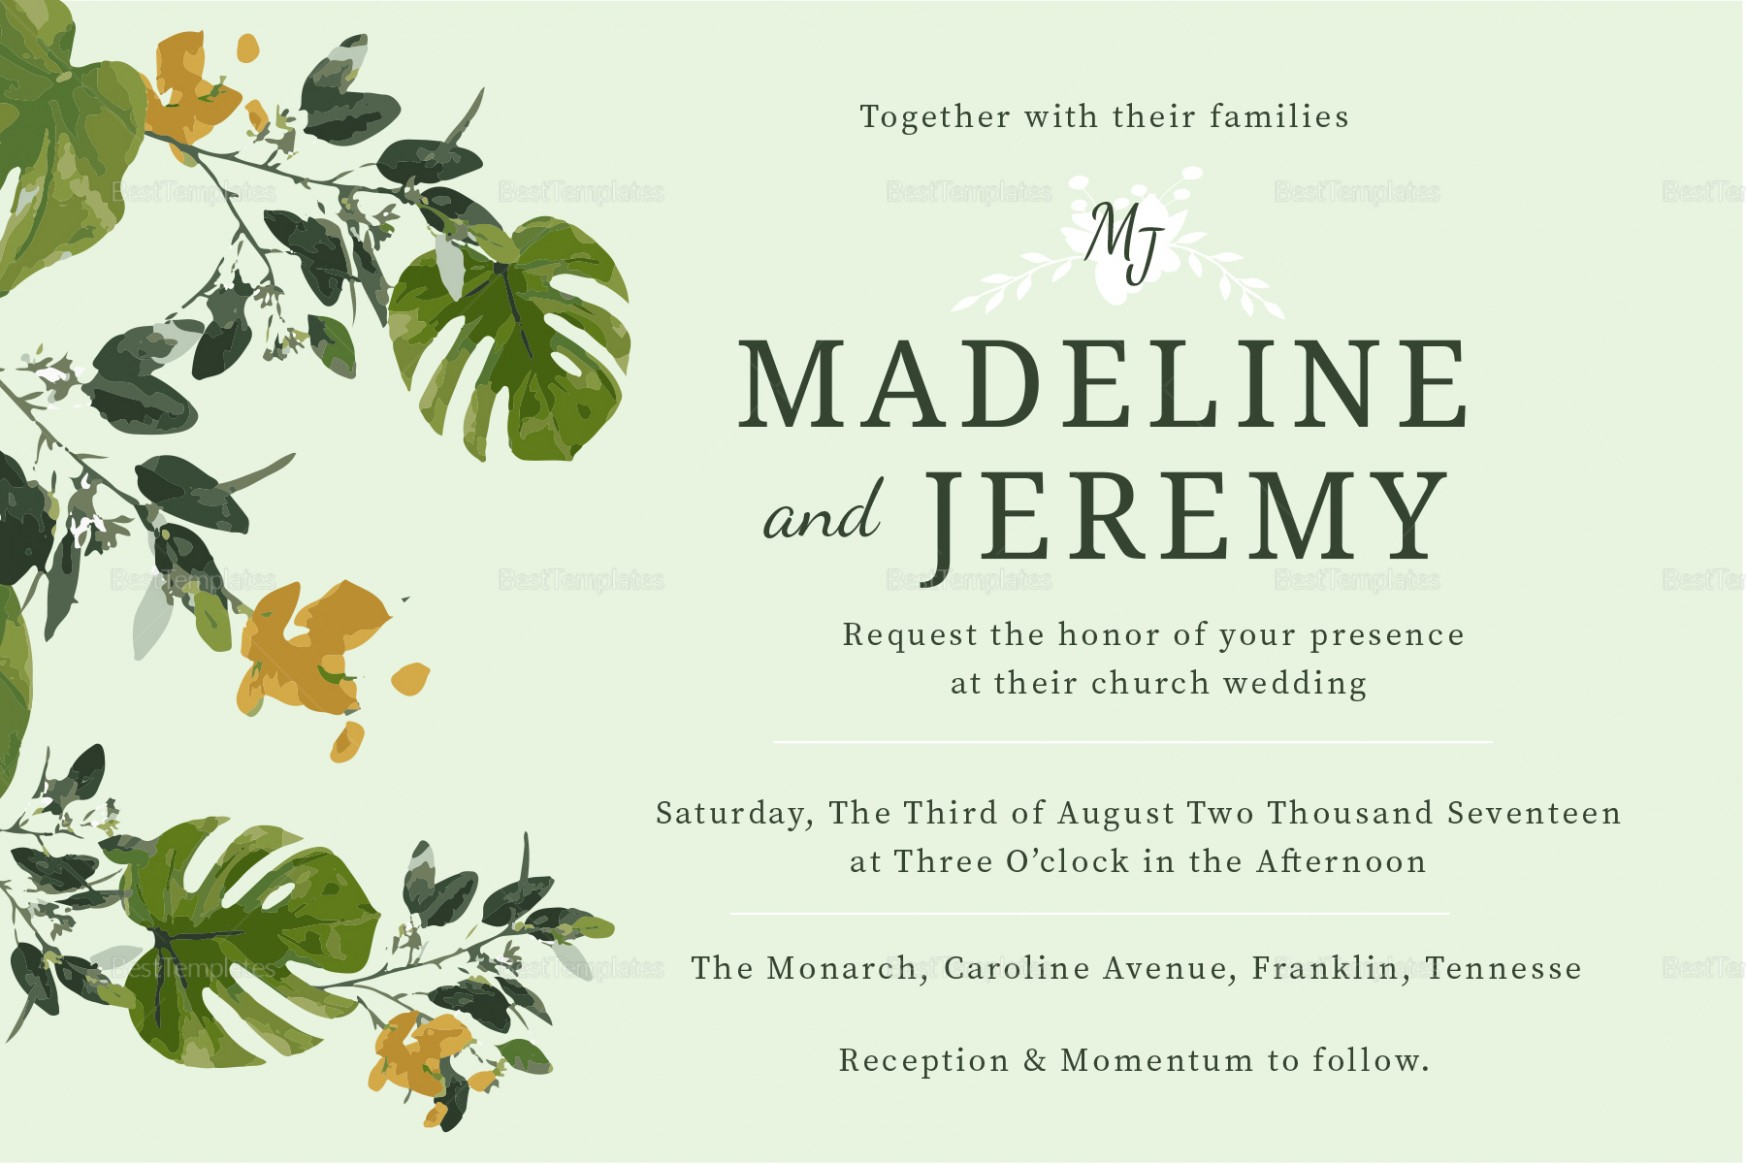 invitation card template landscape  Church Wedding Invitation Design Template in PSD, Word ..